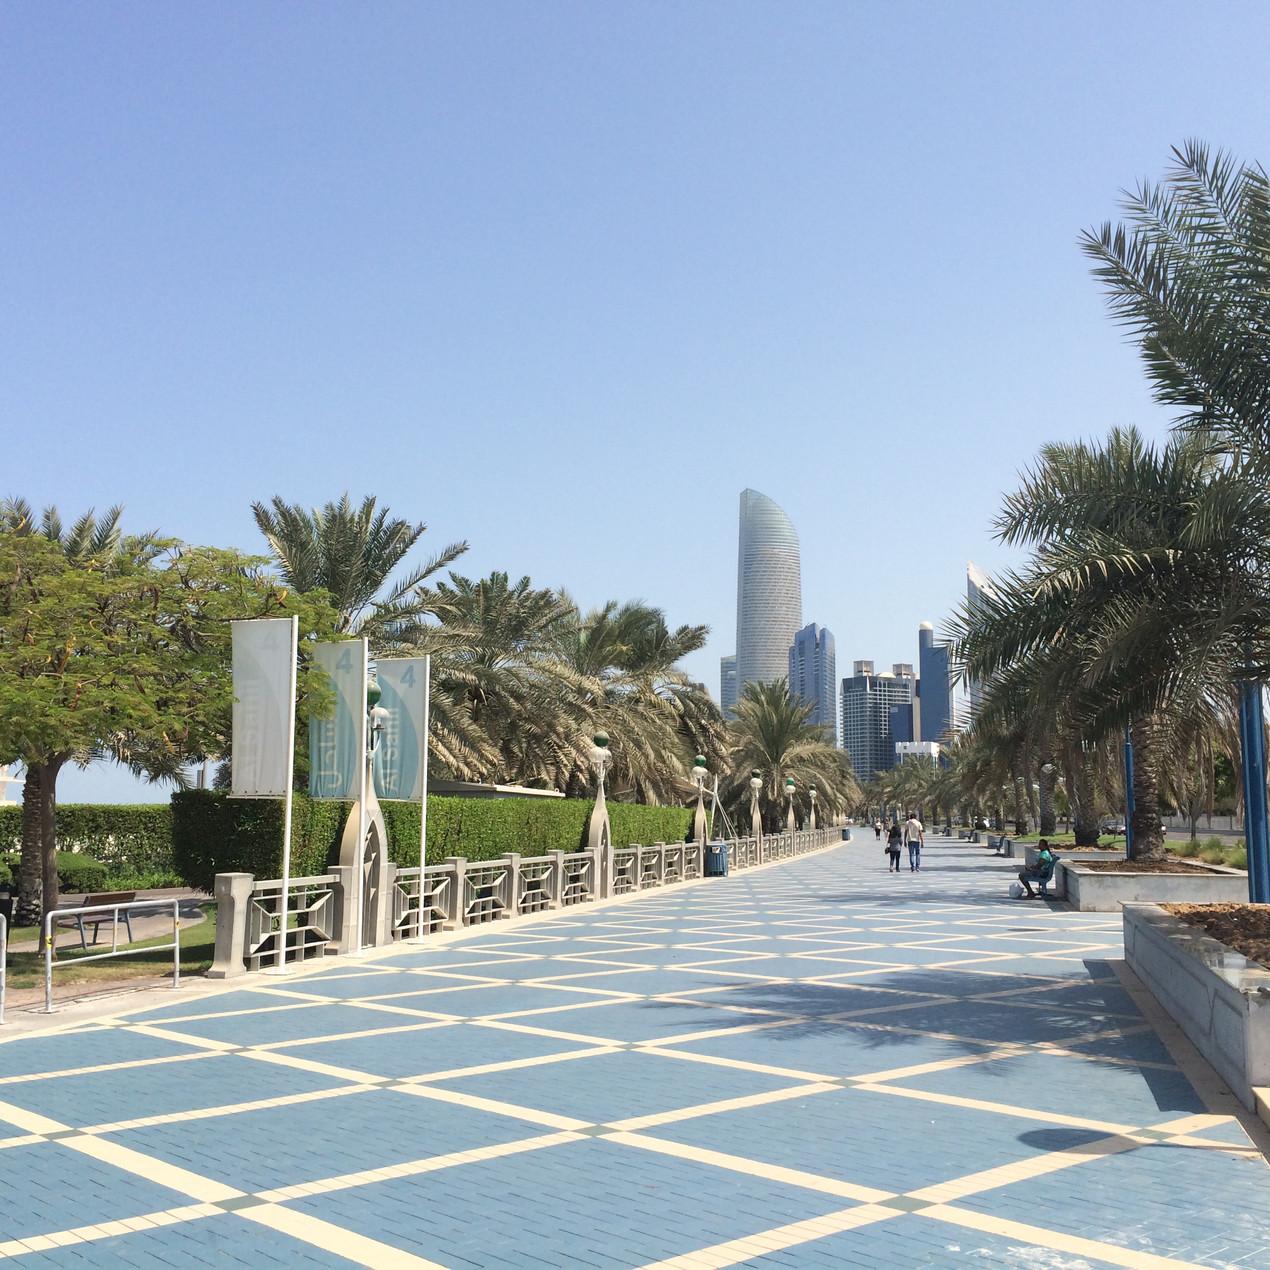 The Corniche in Abu Dhabi